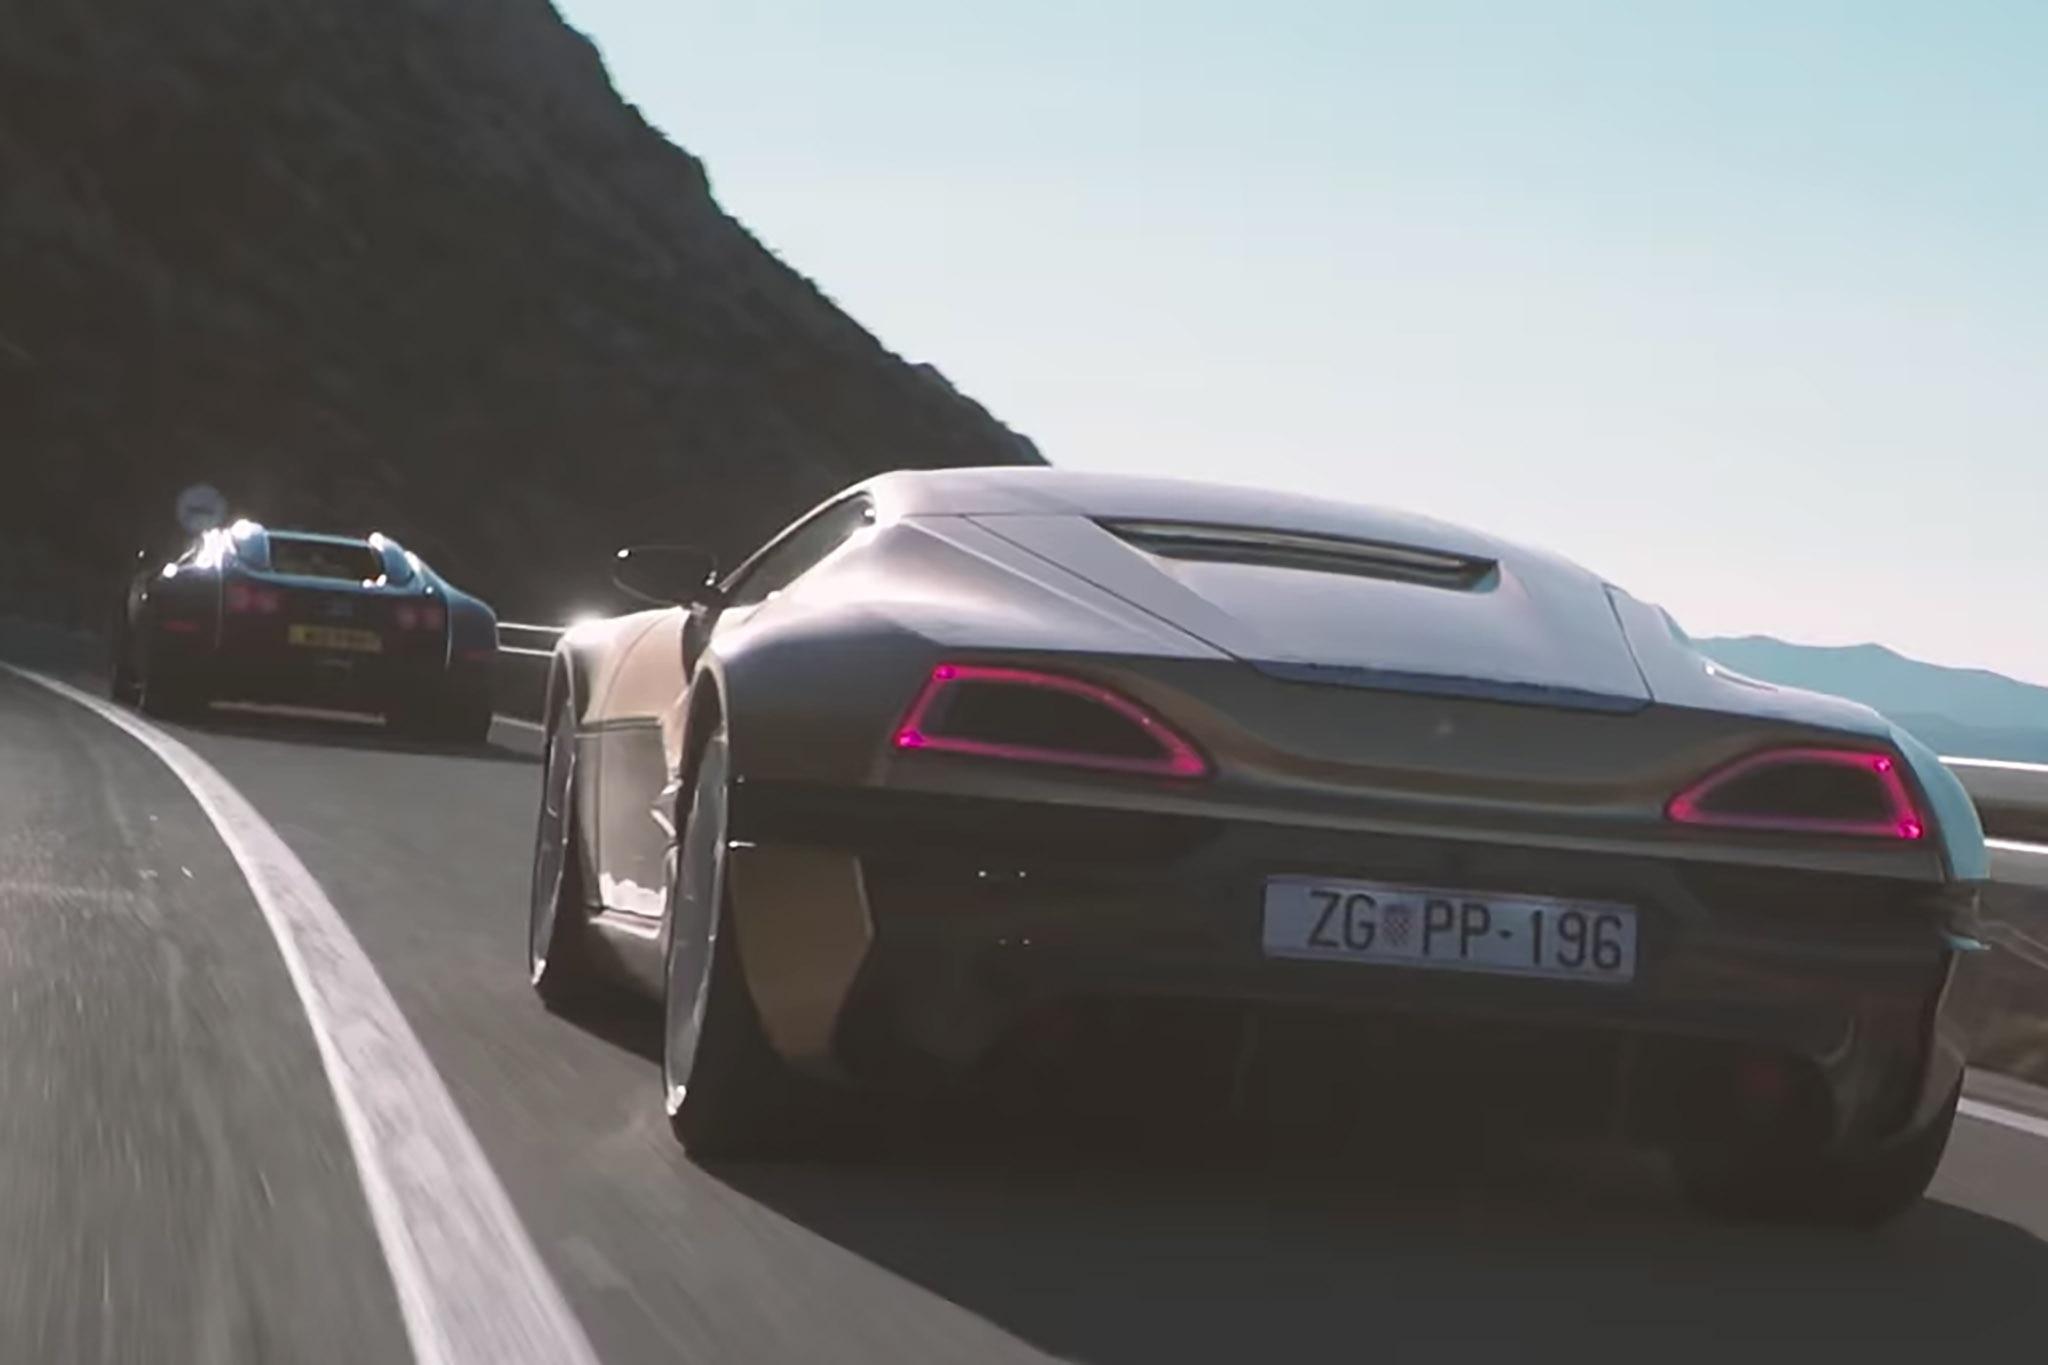 Rimac Concept One Verses Bugatti Veyron Moving